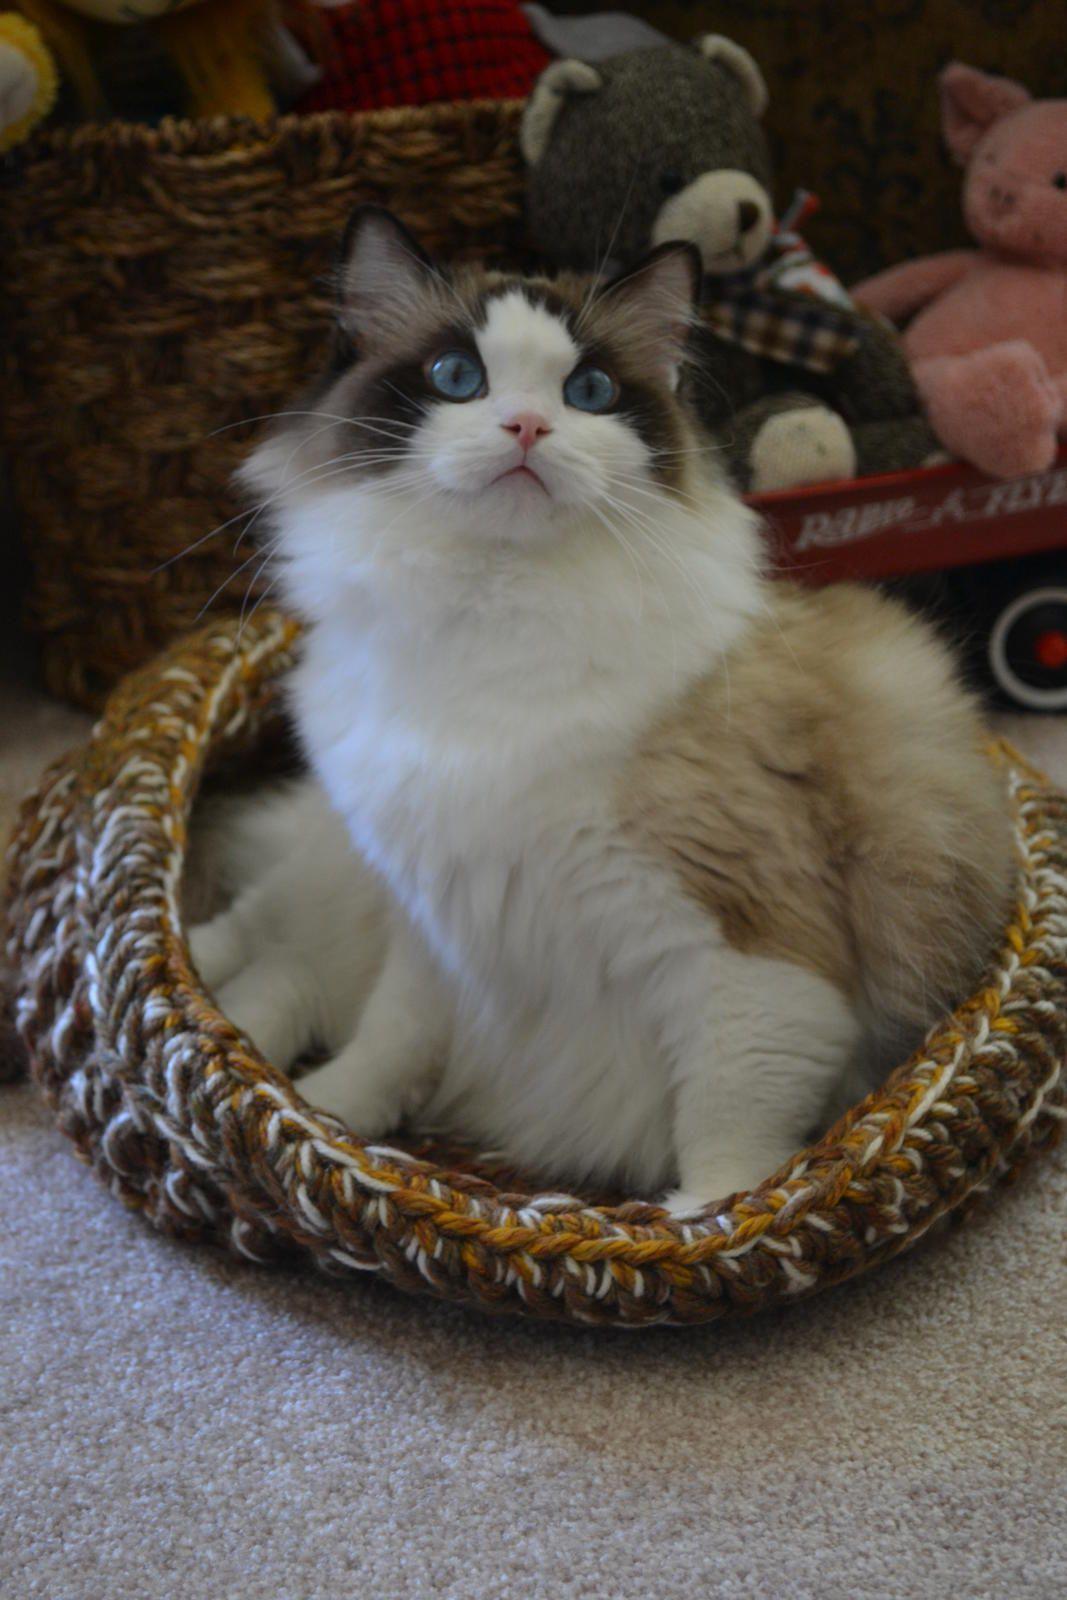 Ragdolls Ragdoll Essex Ontario Cats Kittens Southwestern Ontario Windsor Toronto Michigan Ragdoll Kittens